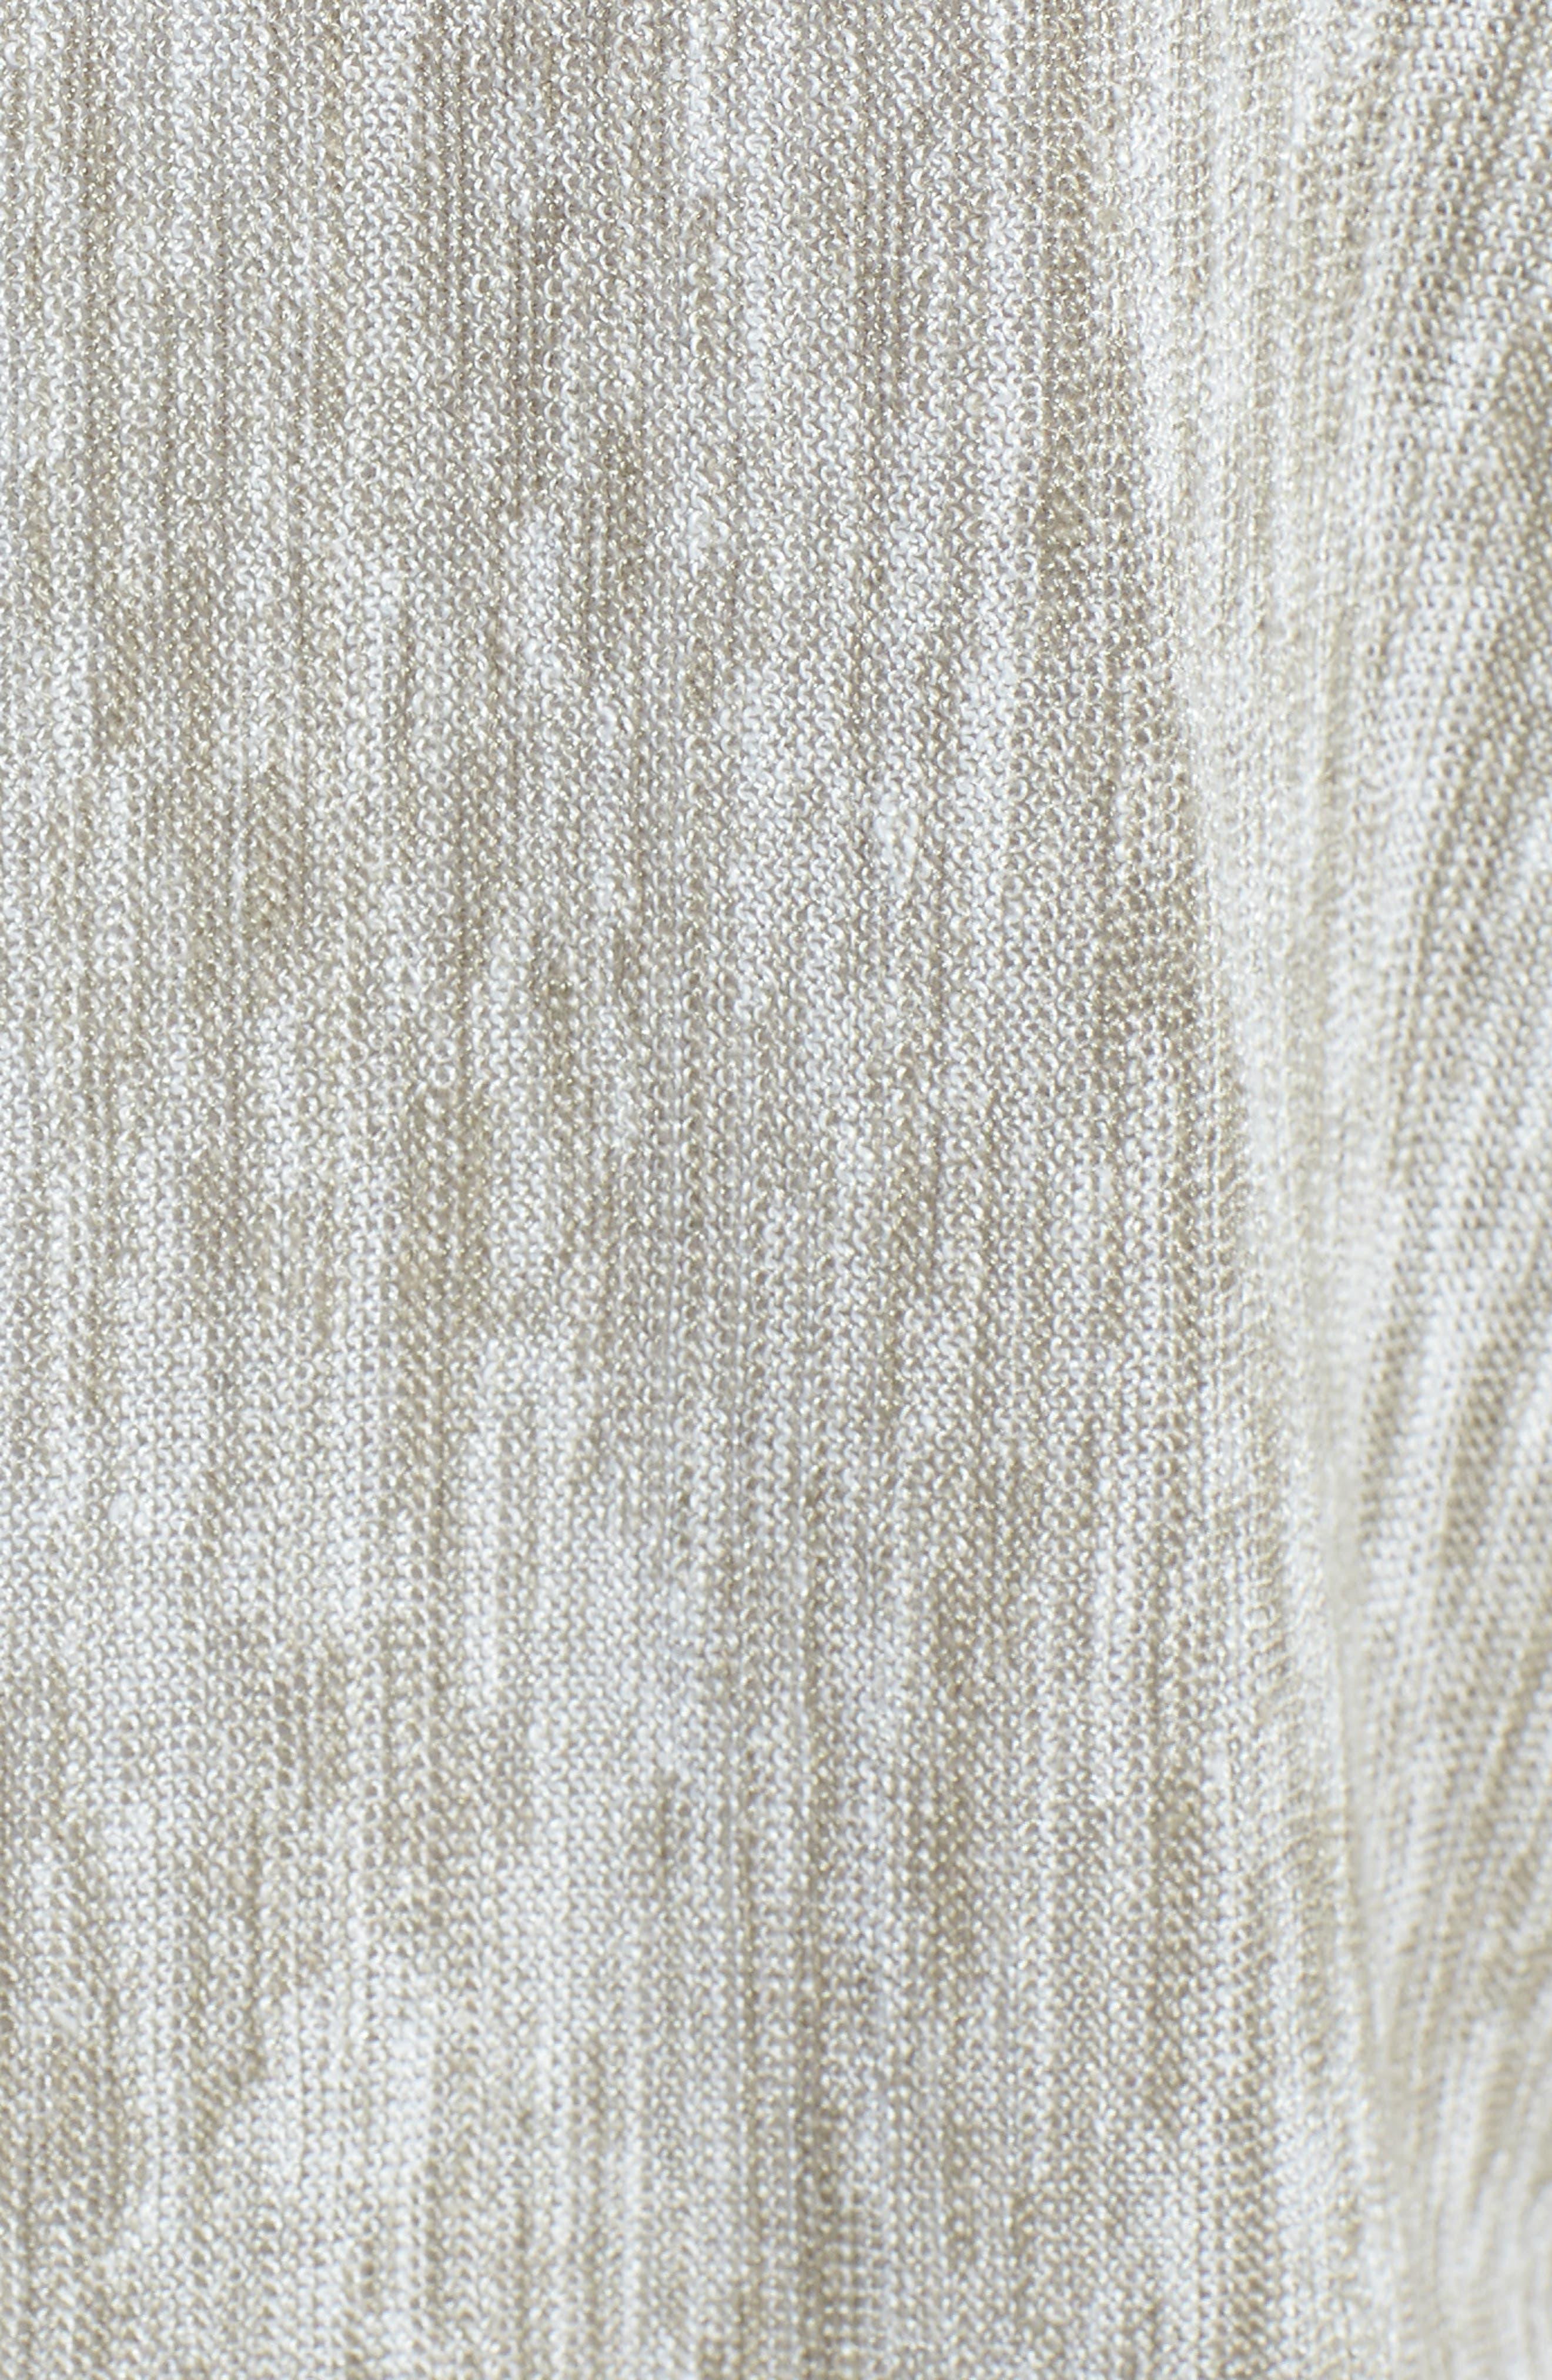 Desert Wind Knit Top,                             Alternate thumbnail 5, color,                             Flax Mix